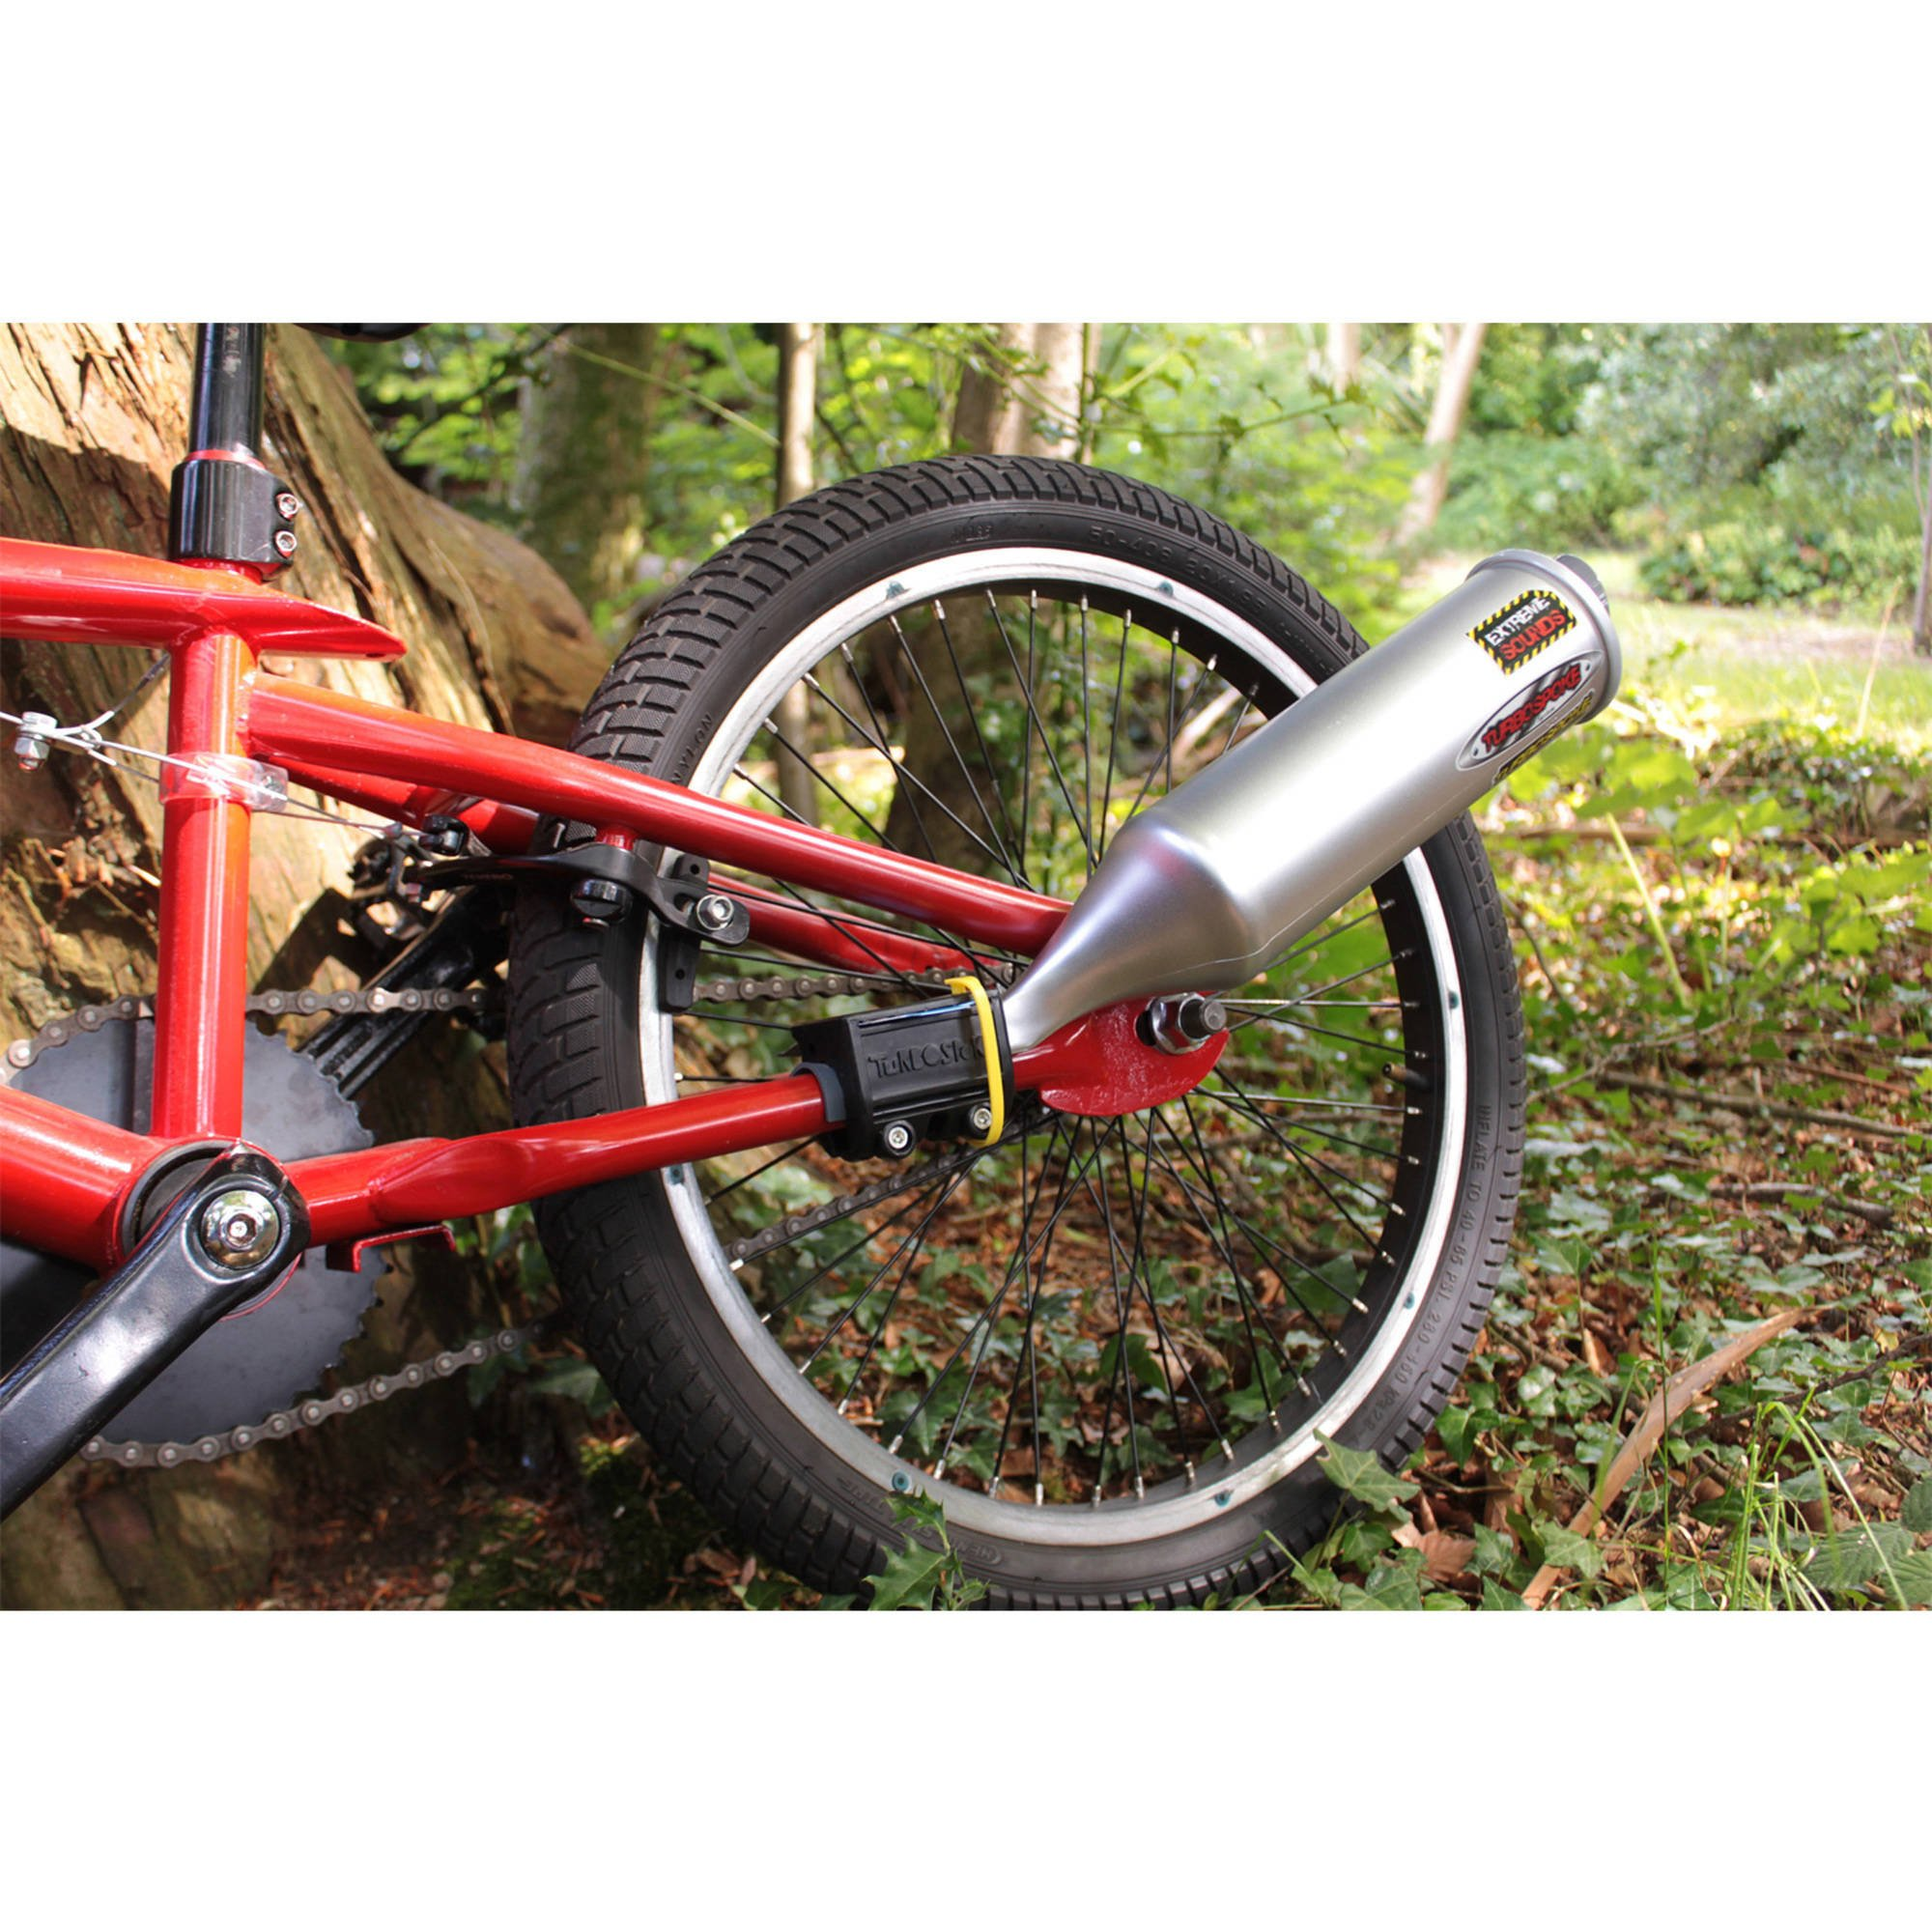 Turbospoke Bicycle Exhaust System (Original Updated) by Turbospoke (Image #4)